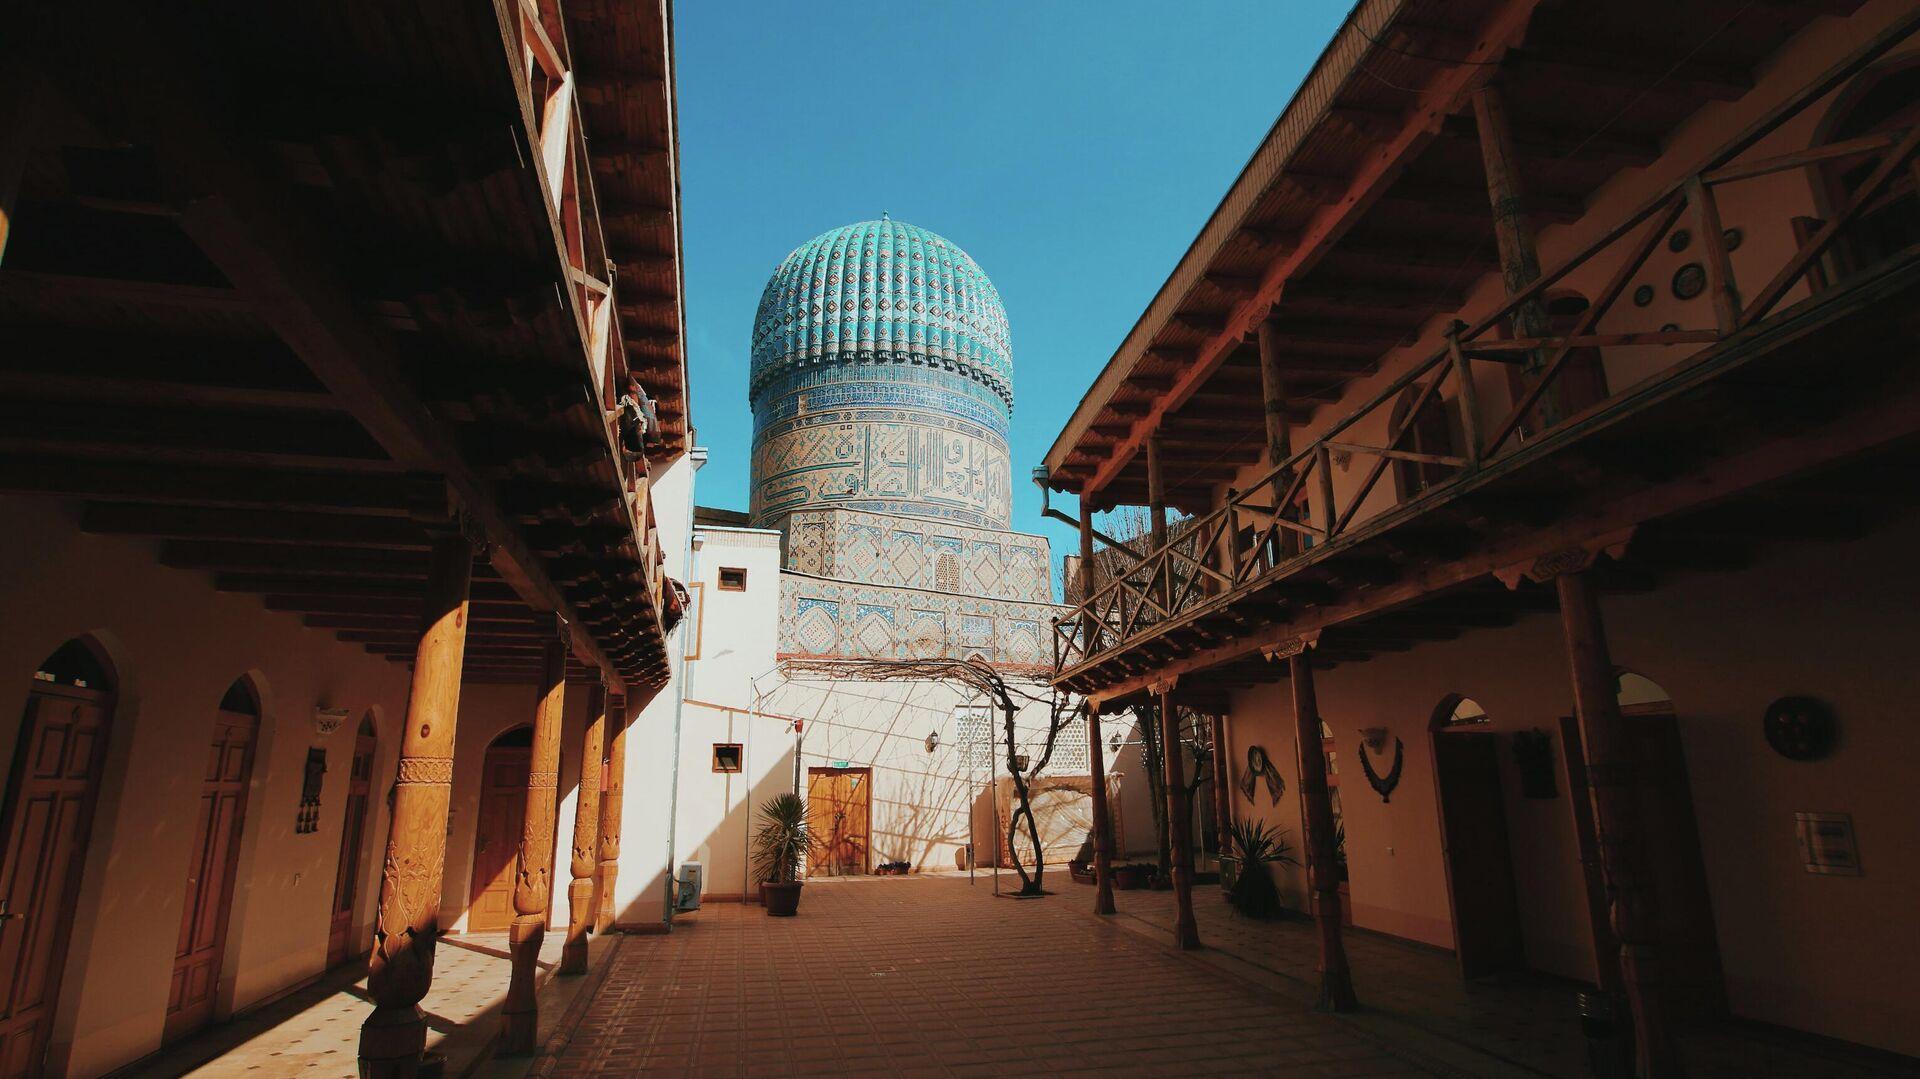 Самарканд, Узбекистан - Sputnik Узбекистан, 1920, 23.09.2021